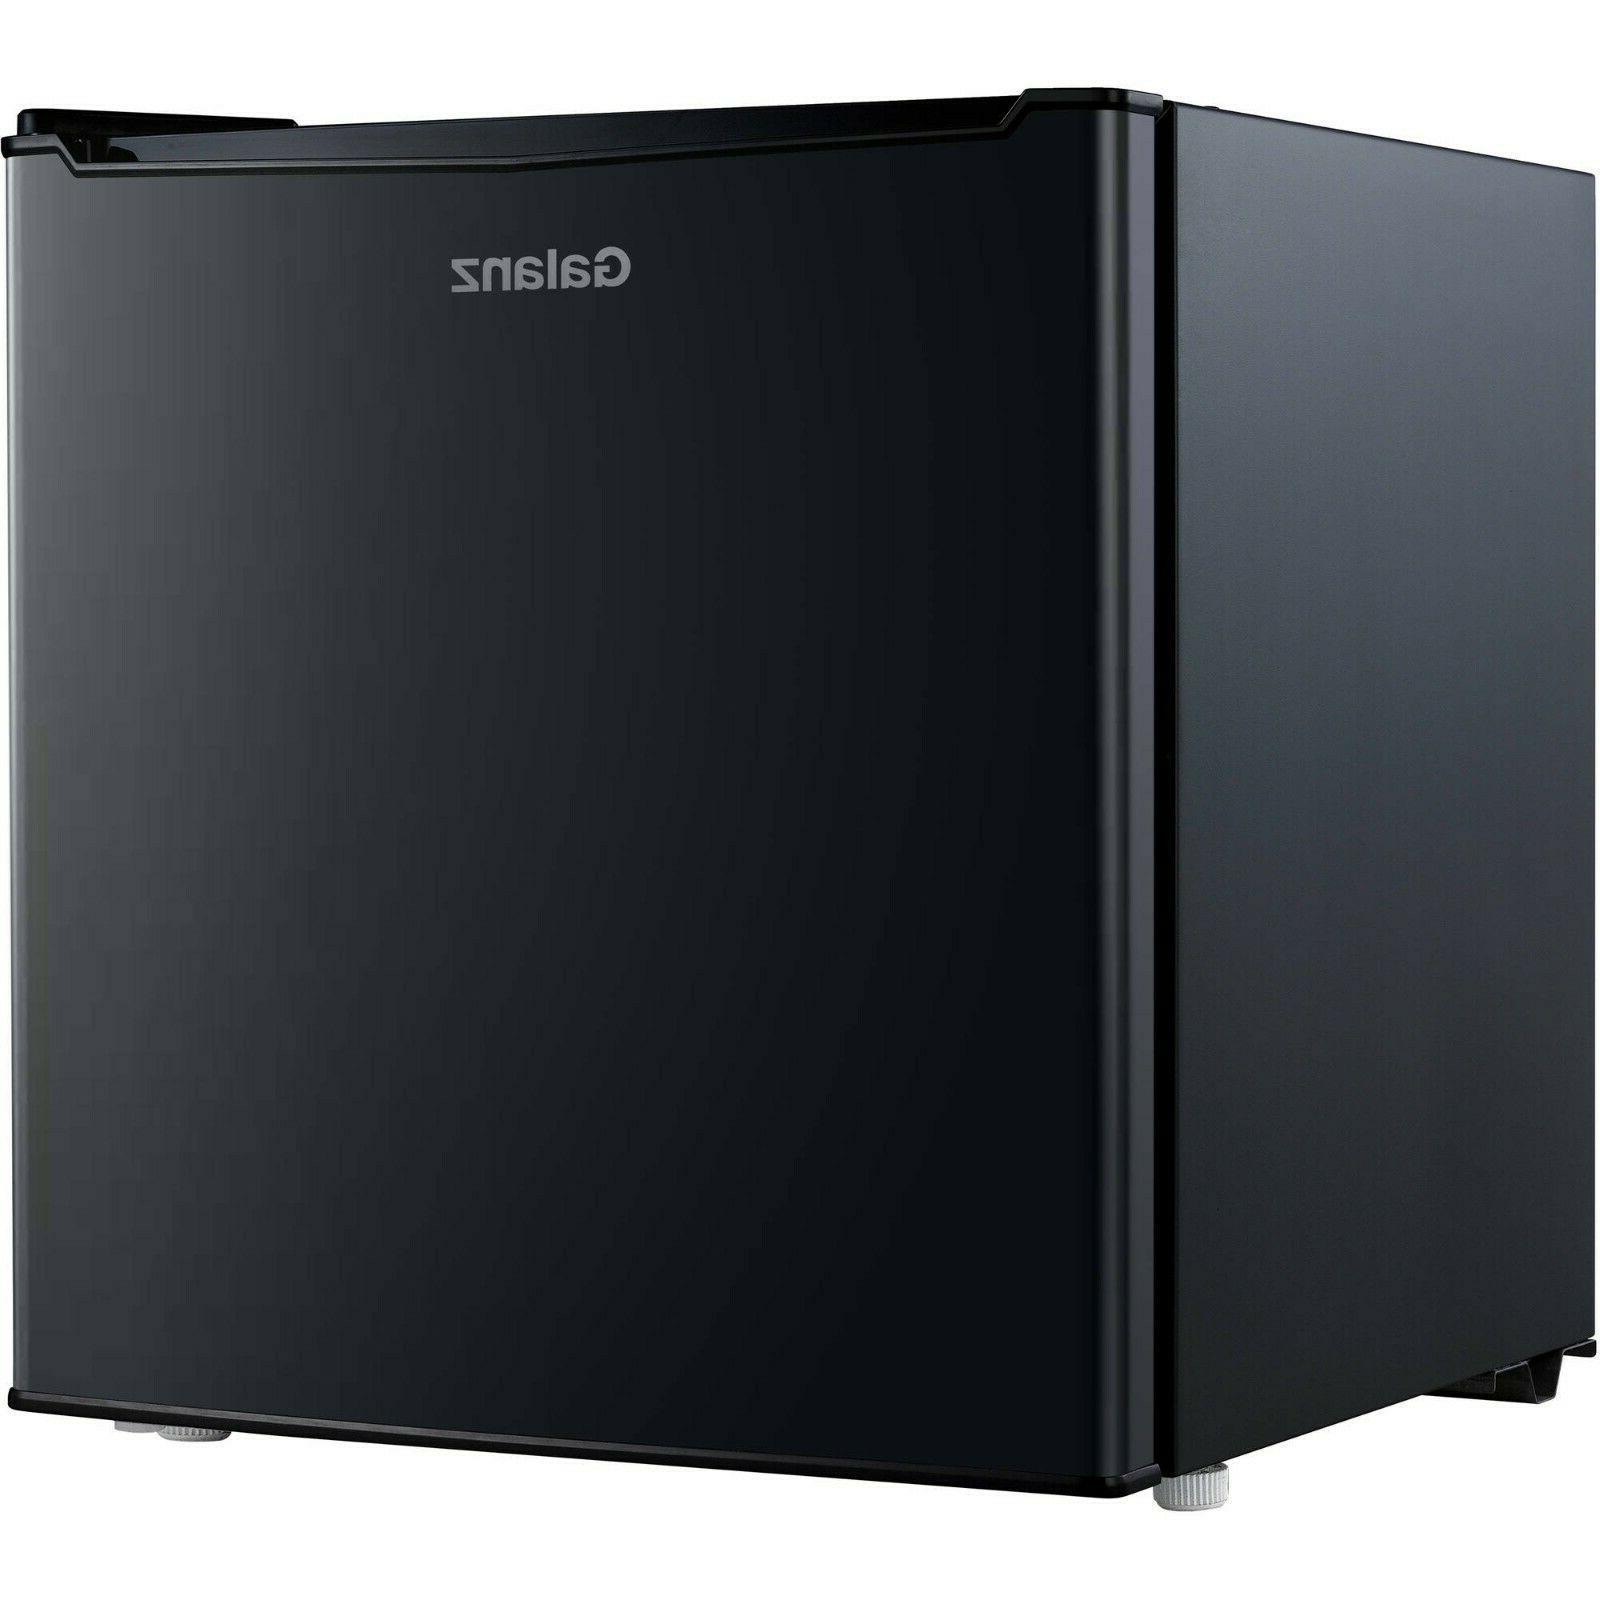 mini fridge 1 7 cubic feet black